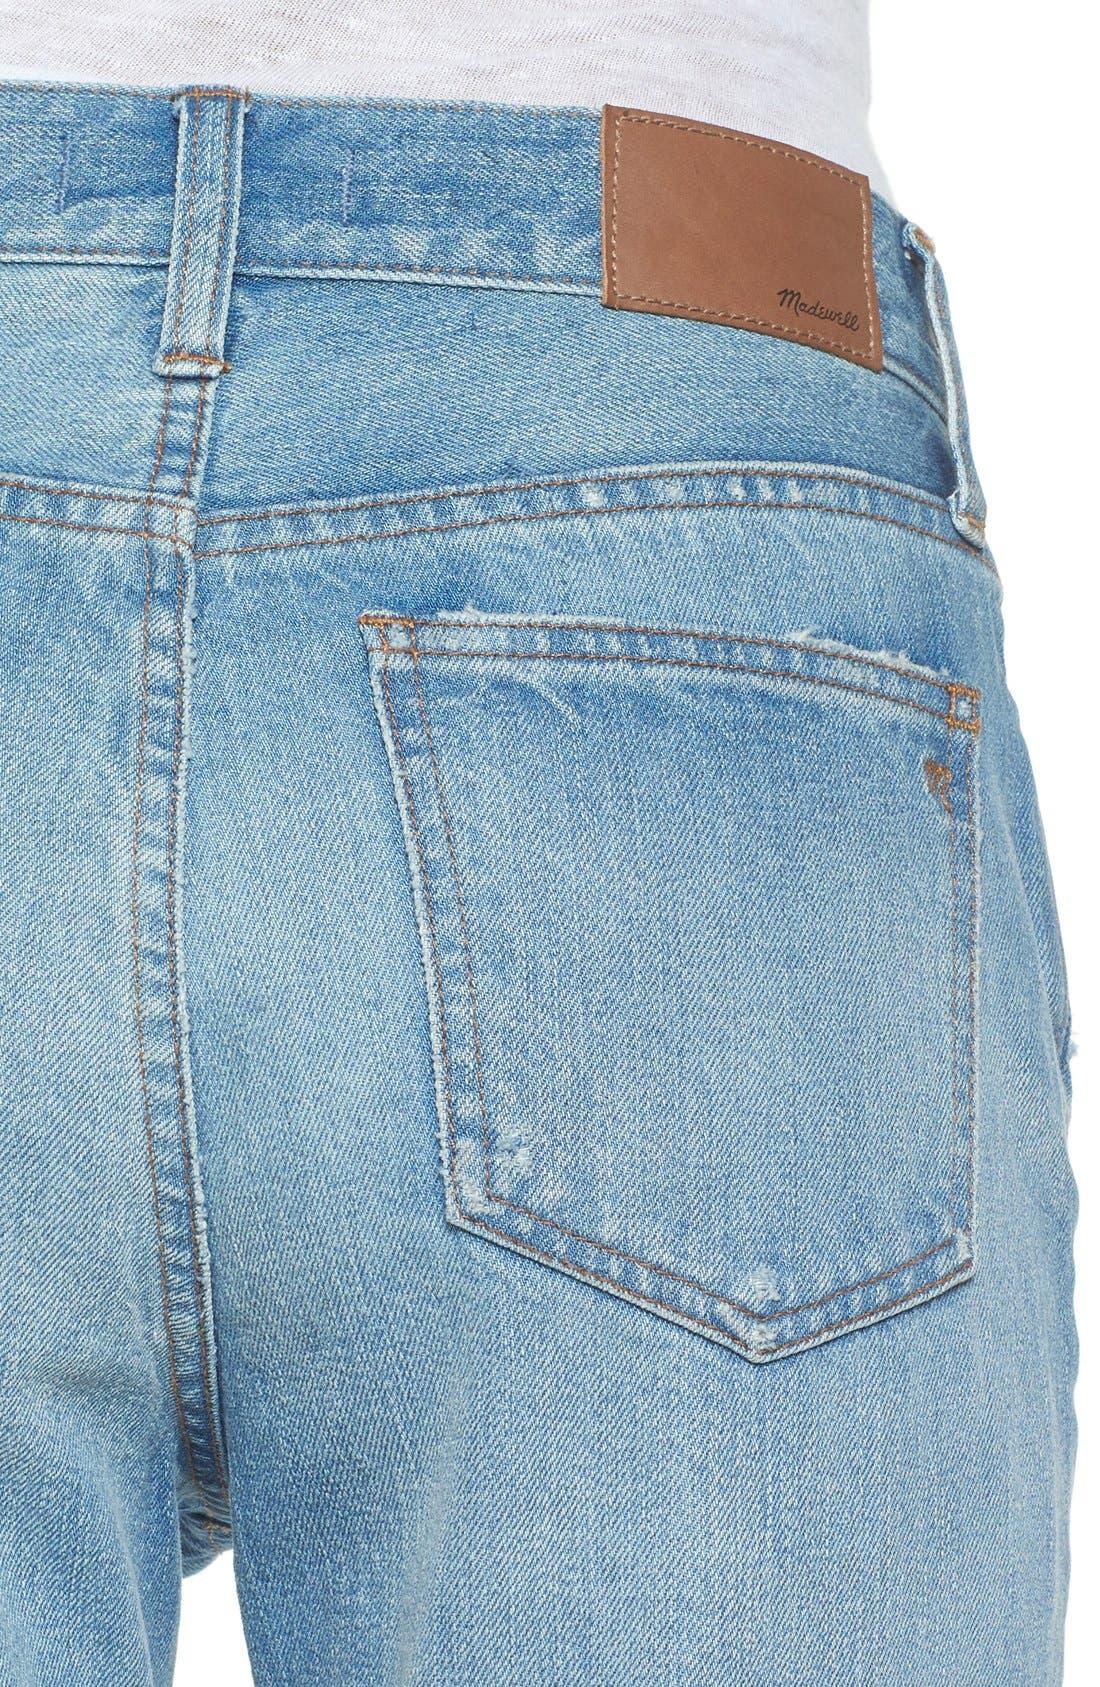 Perfect Vintage Ripped High Waist Boyfriend Jeans,                             Alternate thumbnail 4, color,                             Chet Wash